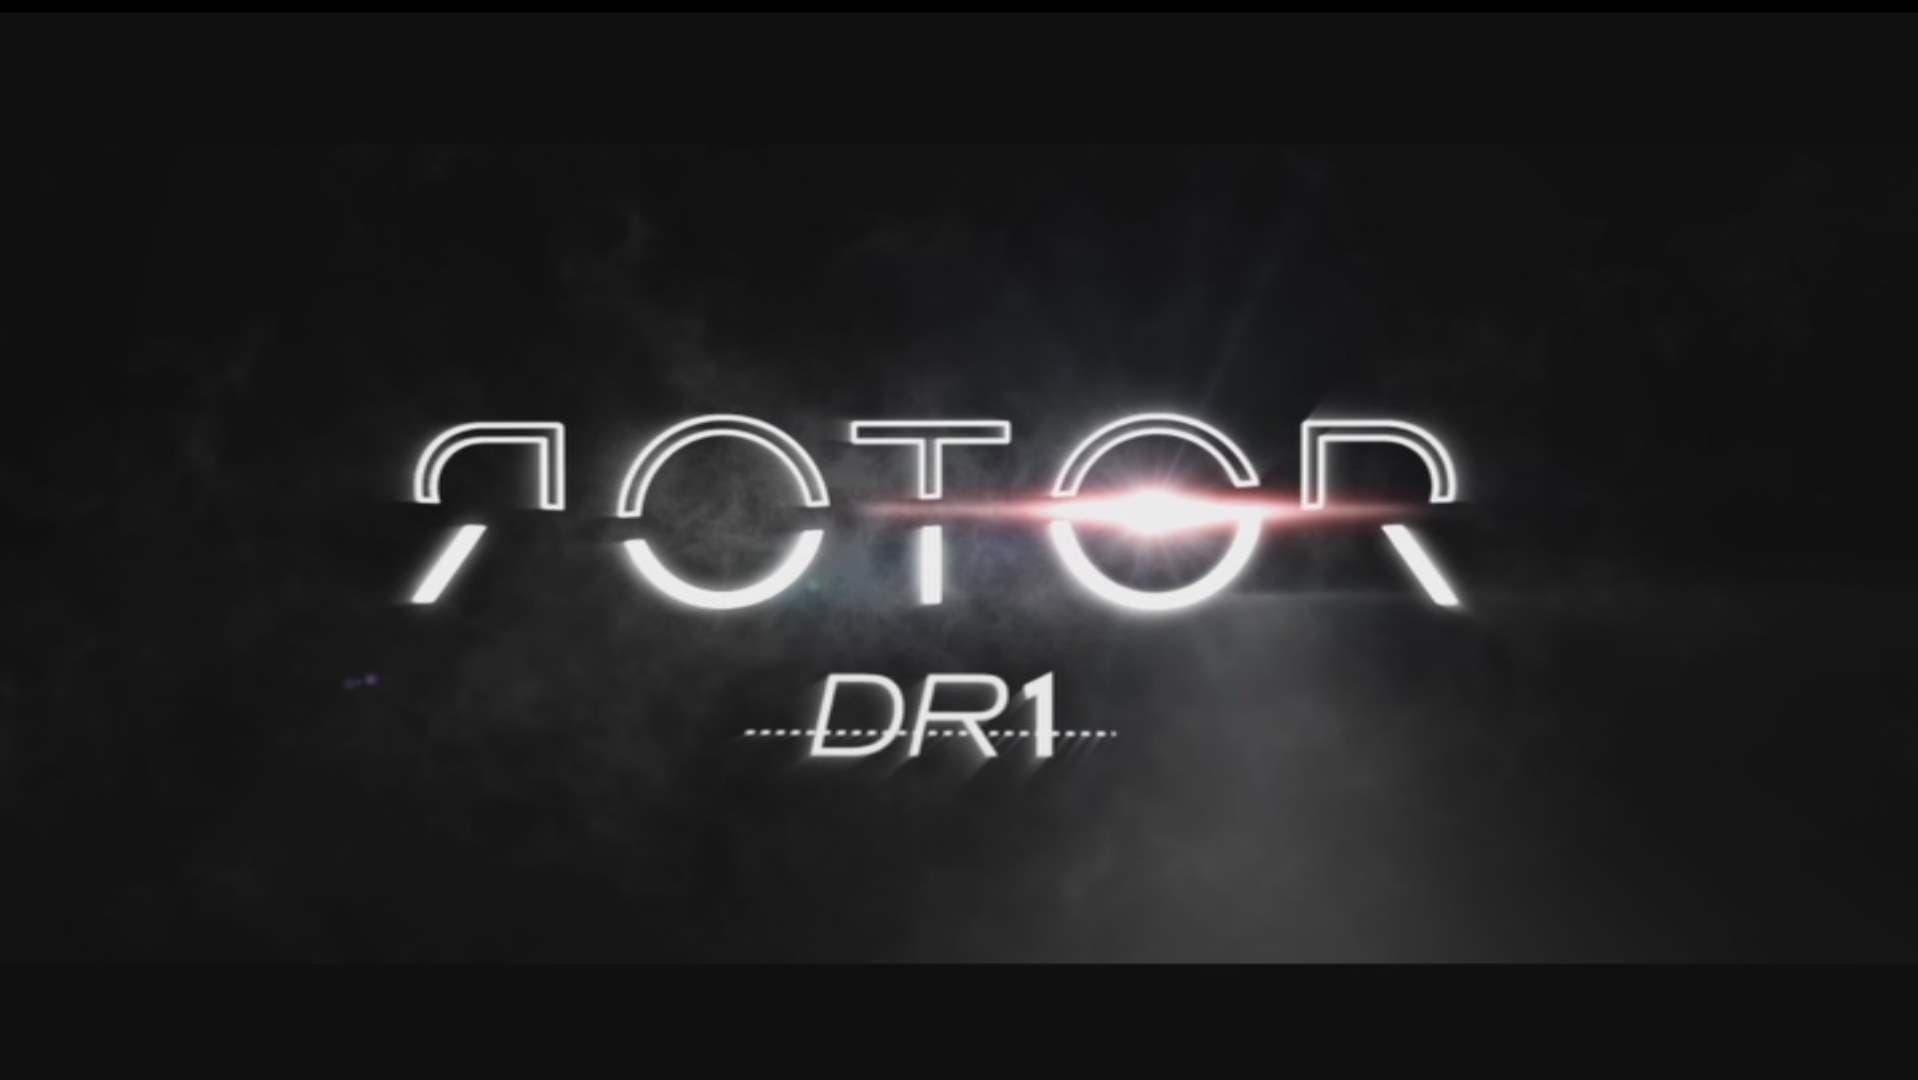 Rotor DR1